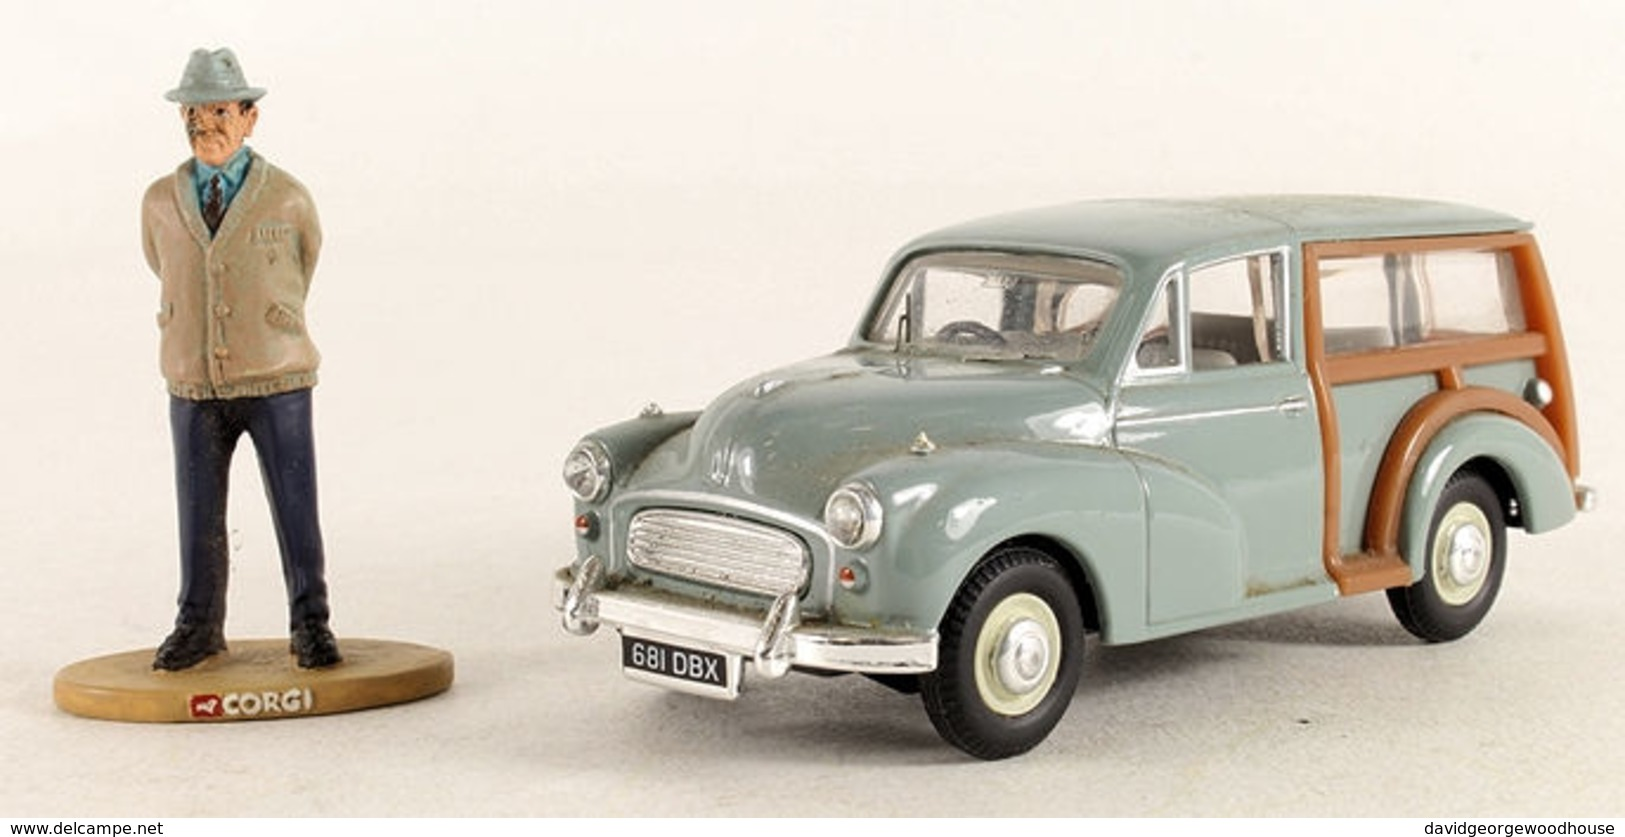 'Heartbeat' Morris Minor Traveller & Figure. - Corgi Toys